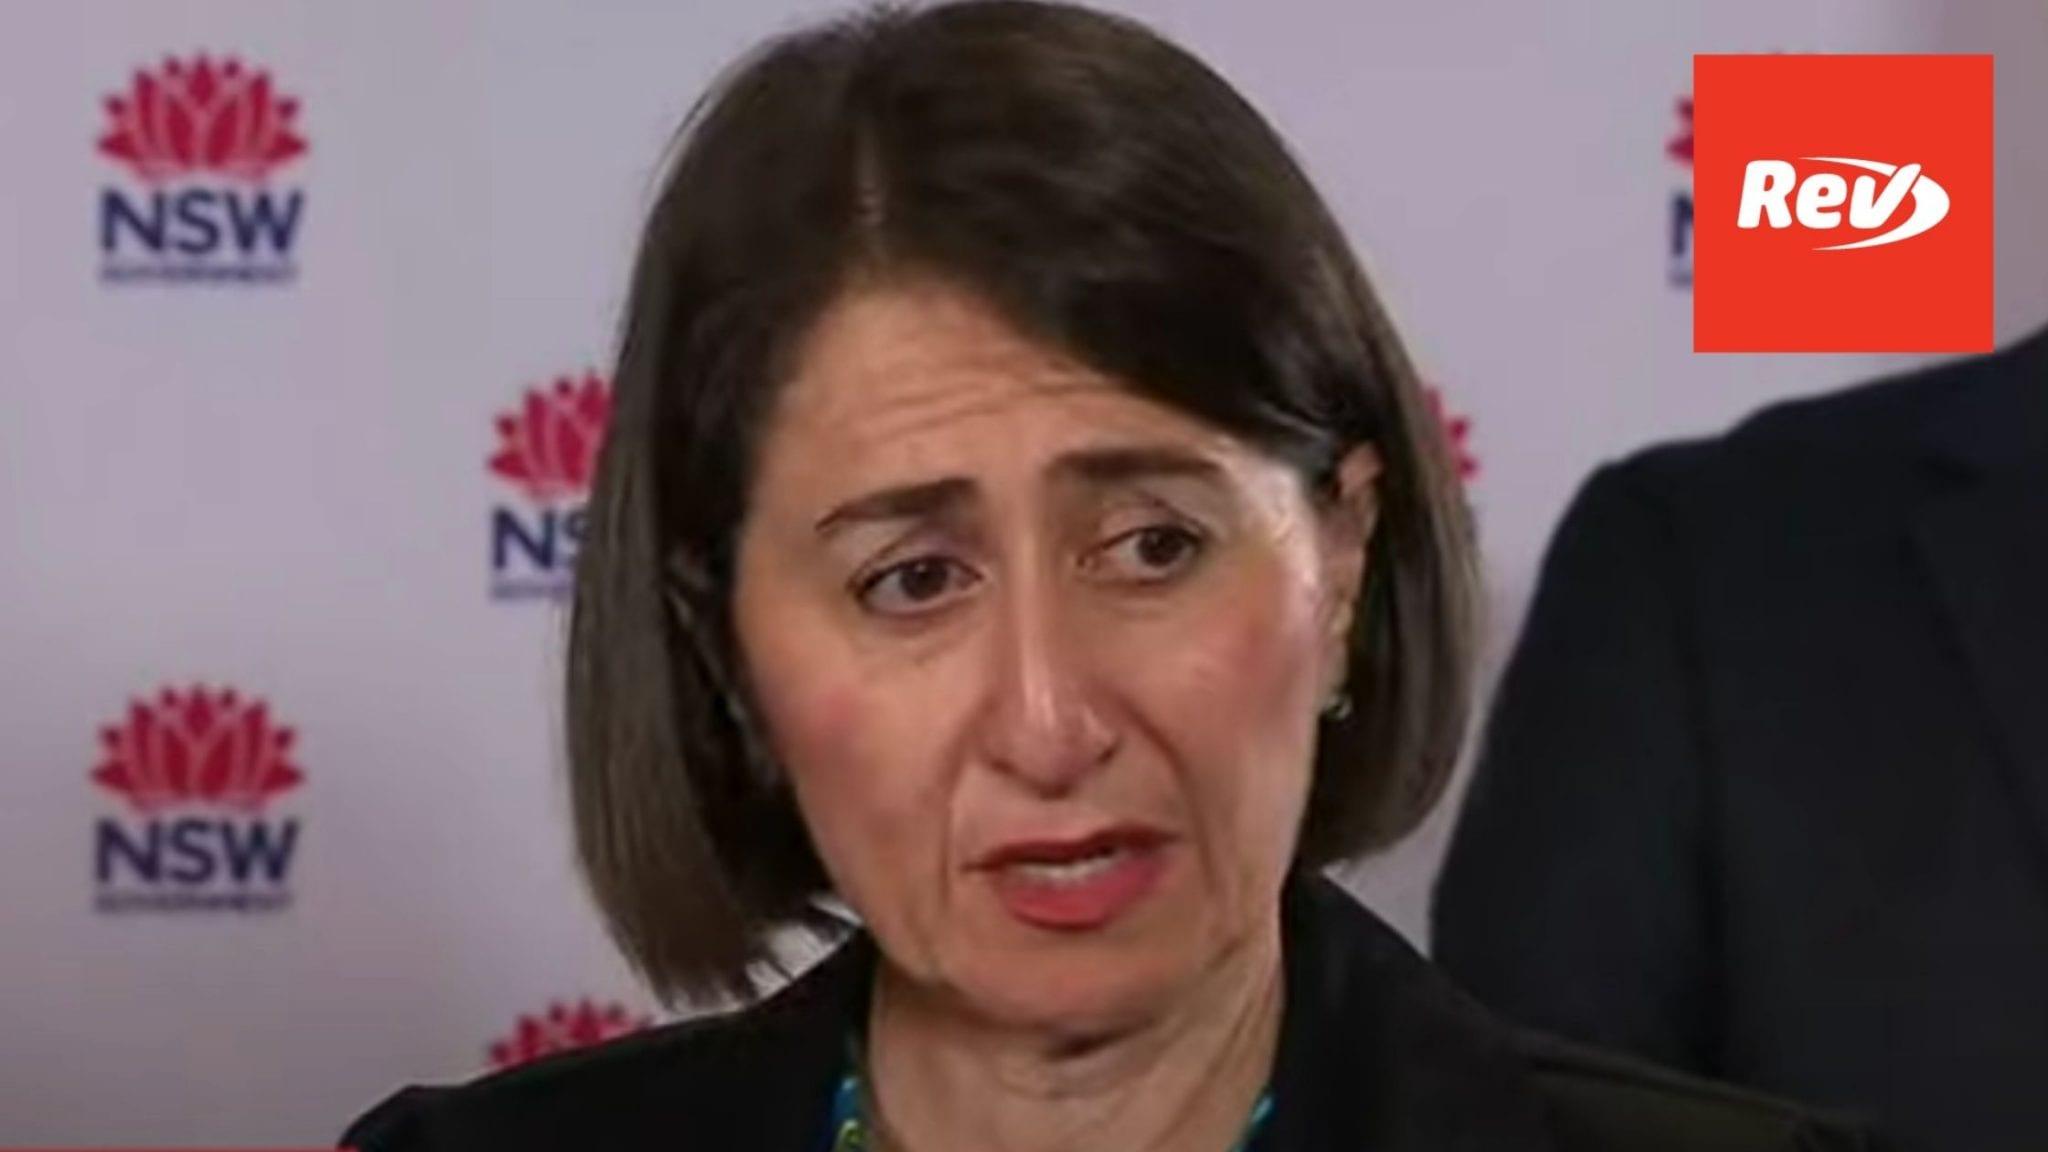 New South Wales Premier Gladys Berejiklian COVID-19 Update December 17